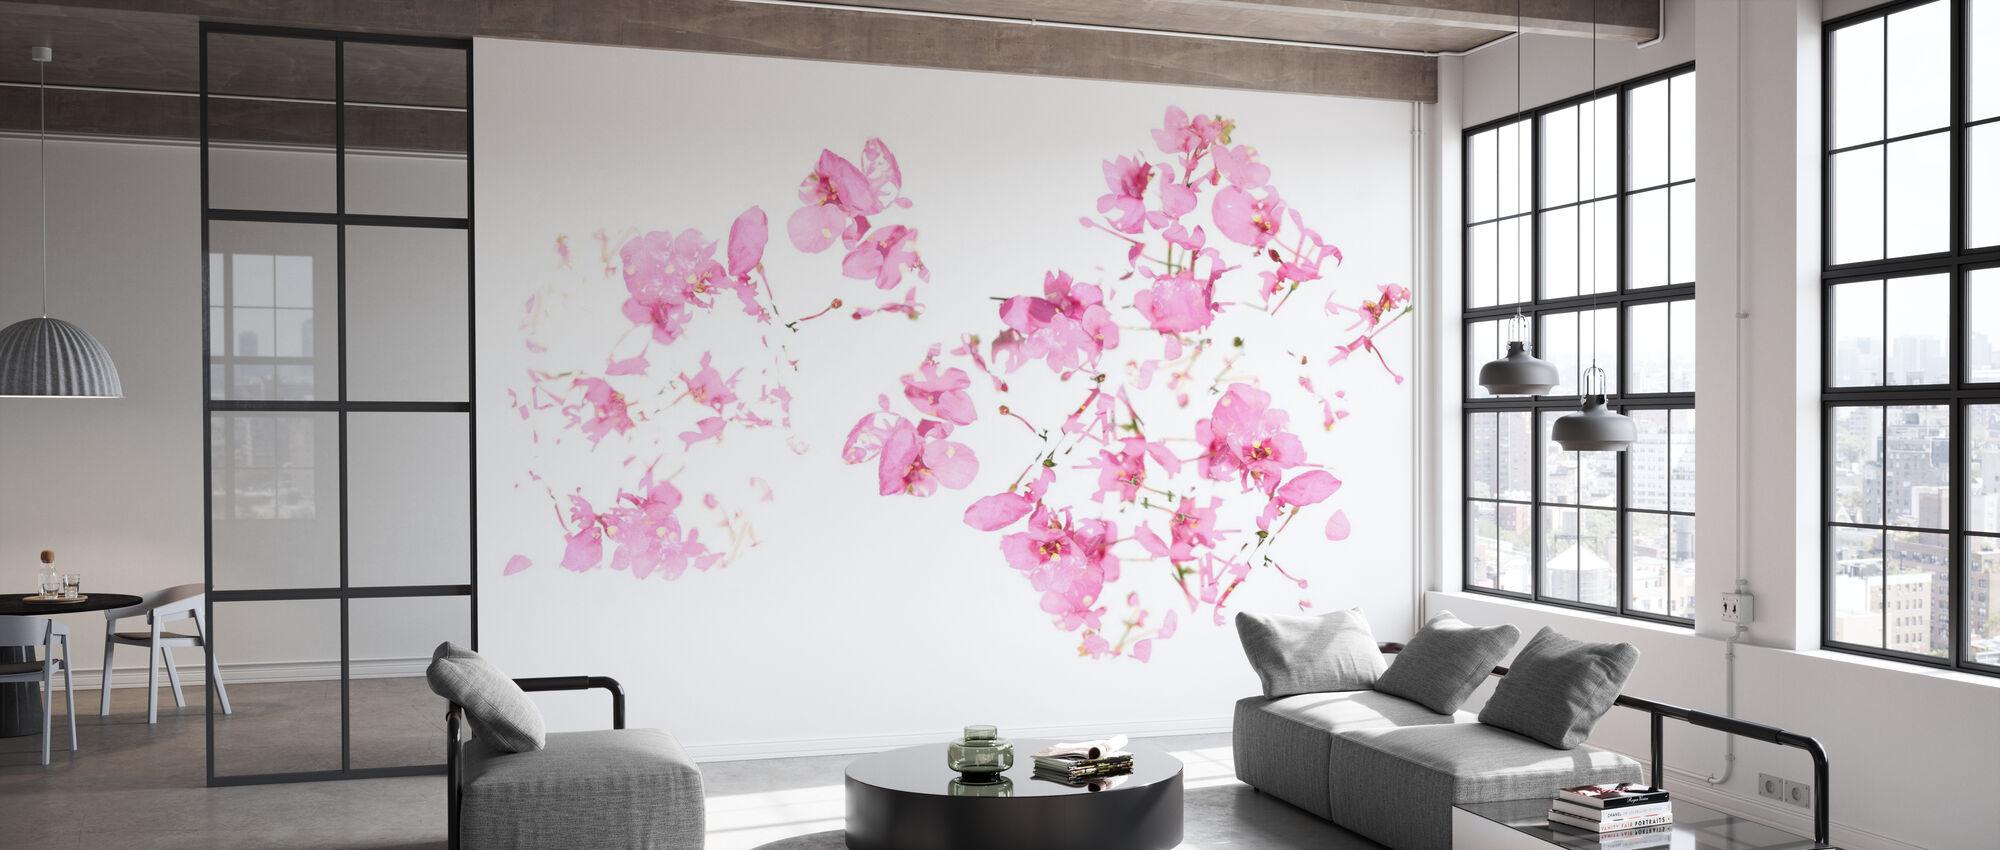 Pink Floral flow - Wallpaper - Office